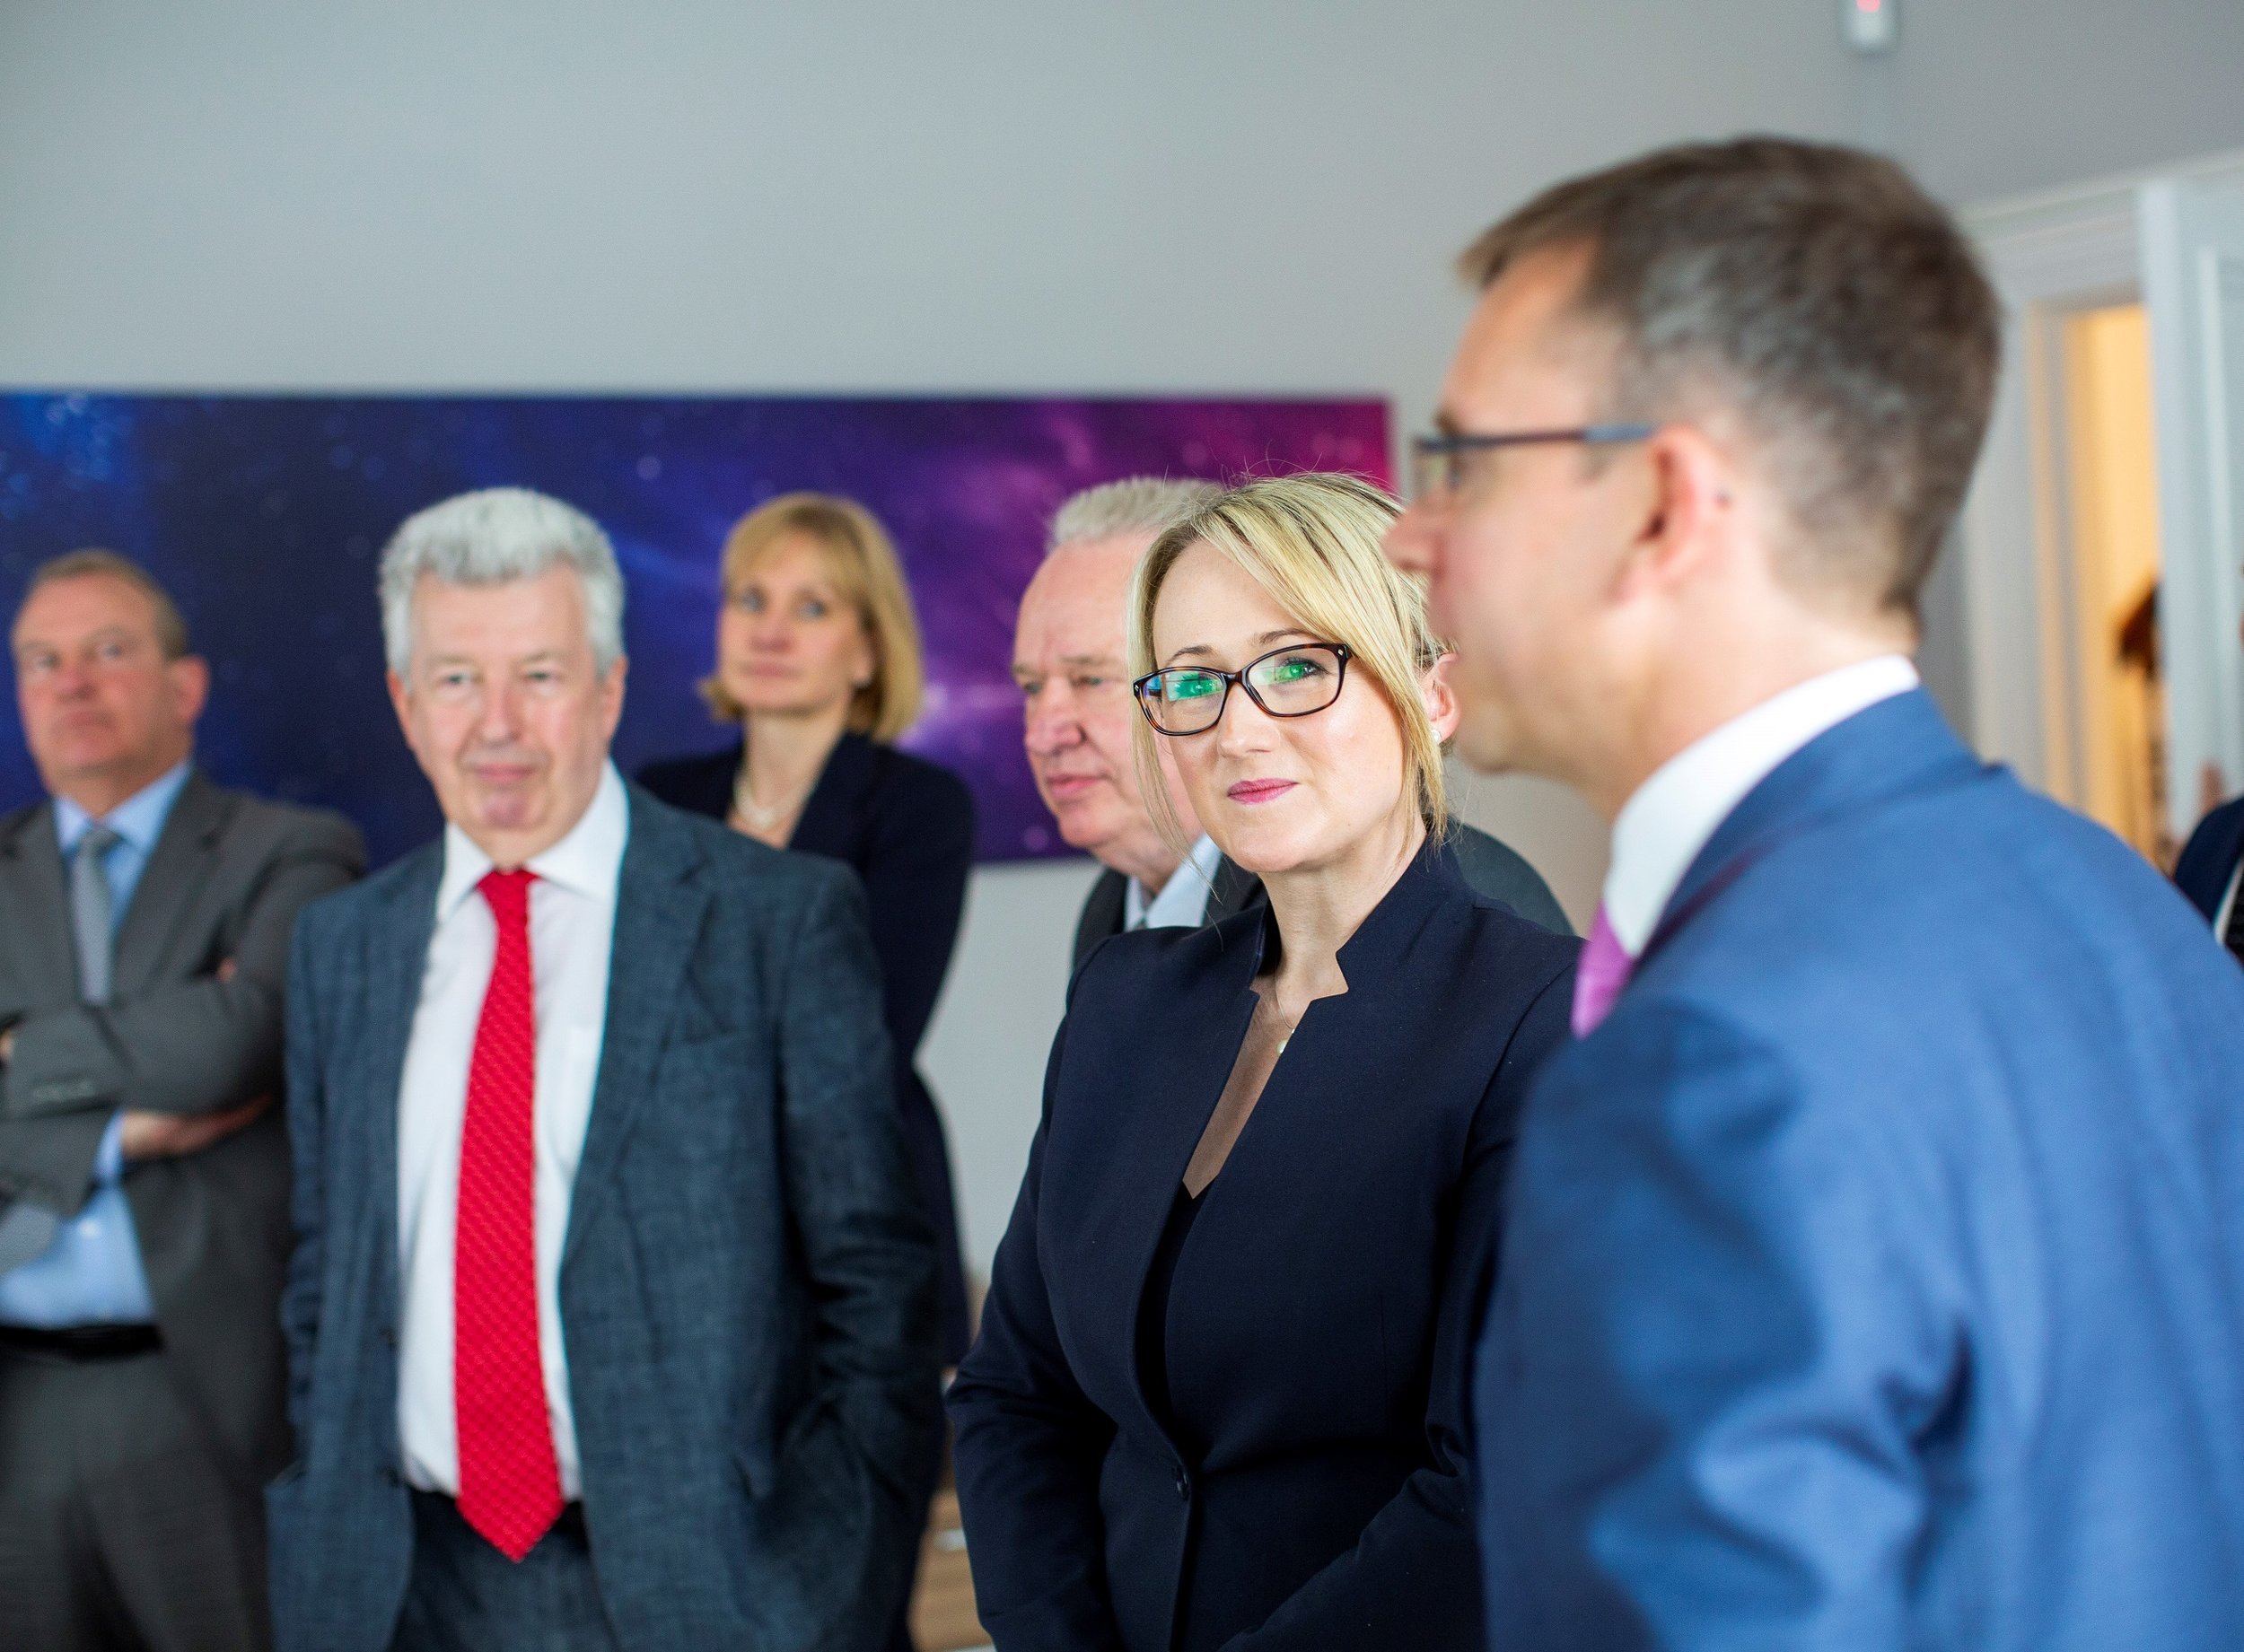 Rebecca Long-Bailey and Lewis MacDonald meet with Chris Ayres